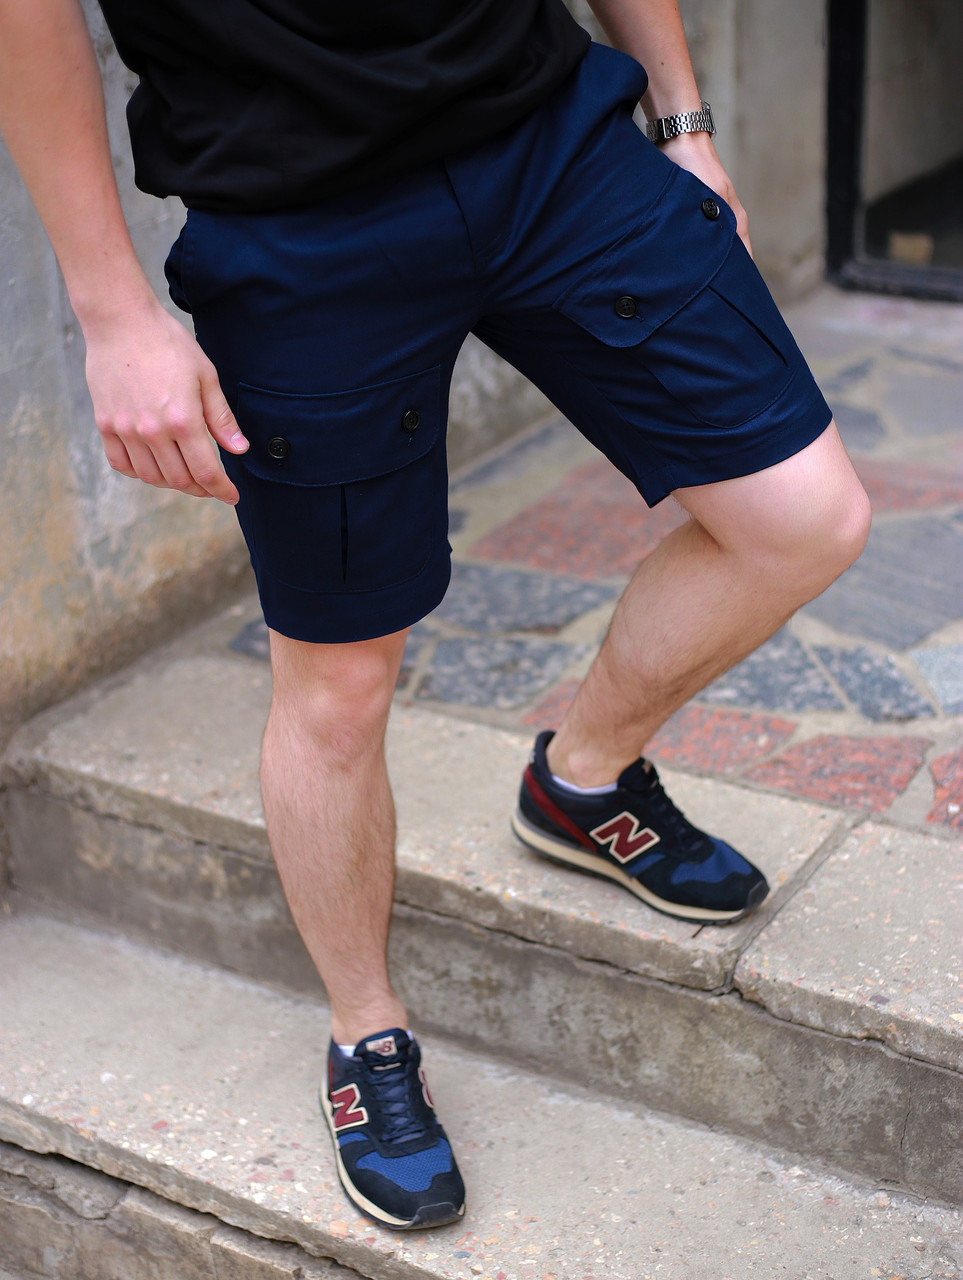 Шорты карго мужские темно-синие бренд ТУР модель Брутто (Brutto) S, M, L, XL, XXL